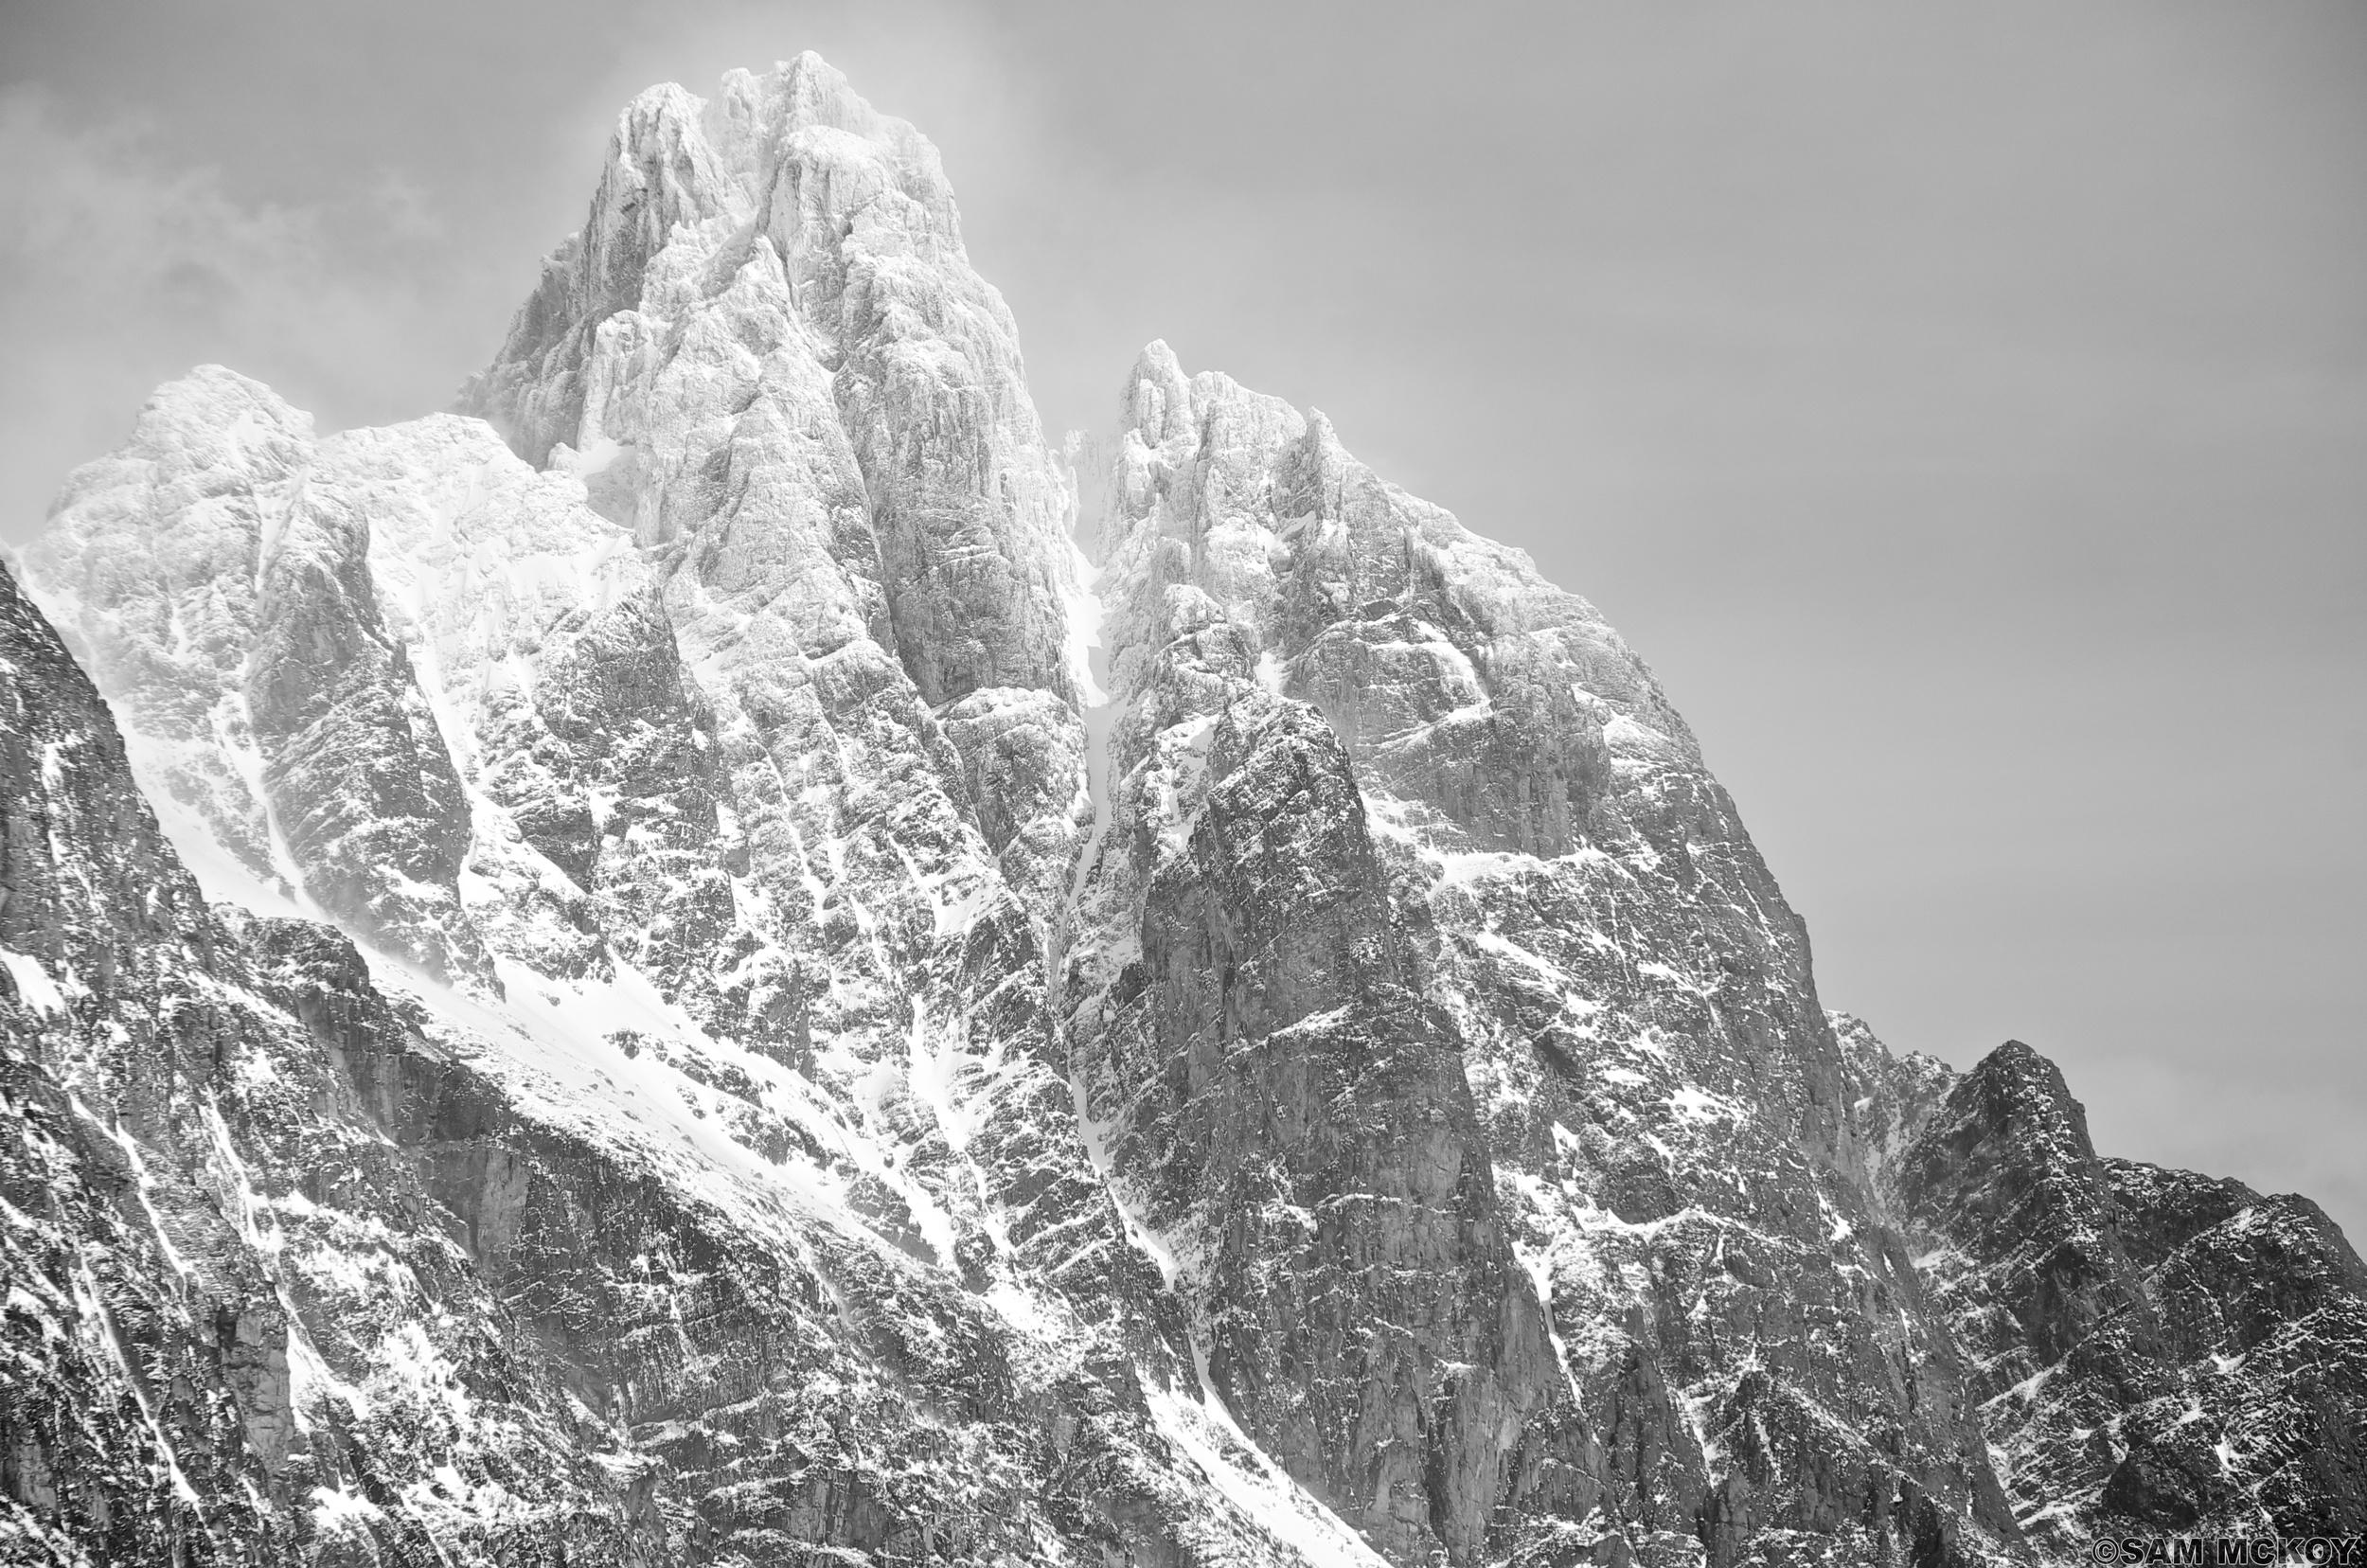 The mountains bordering Chilko Lake